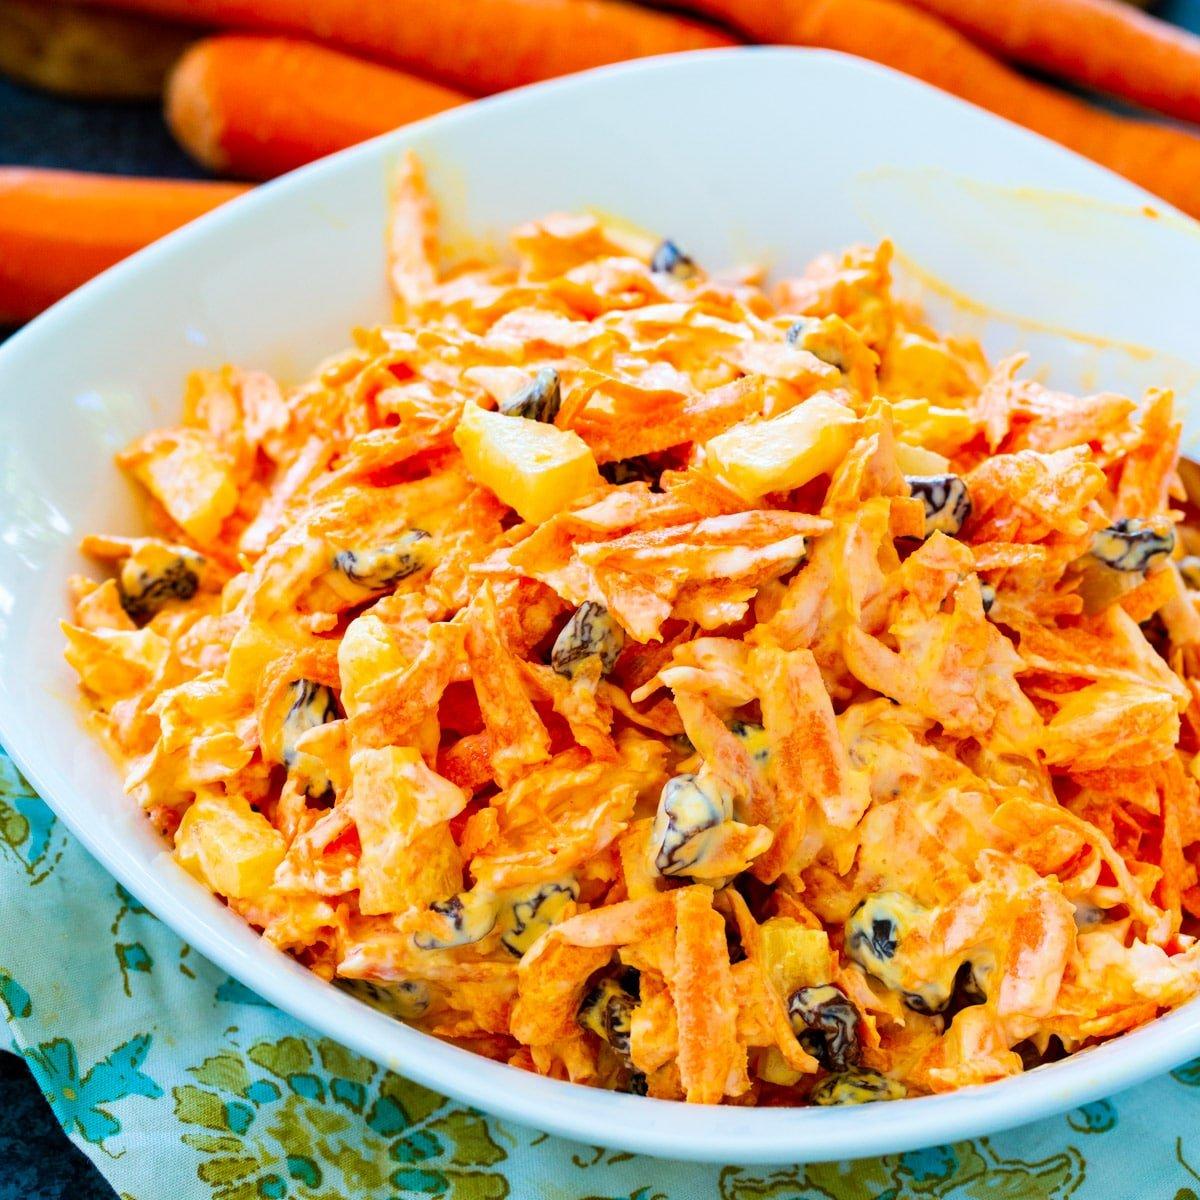 Carrot Raisin Salad in a white bowl.